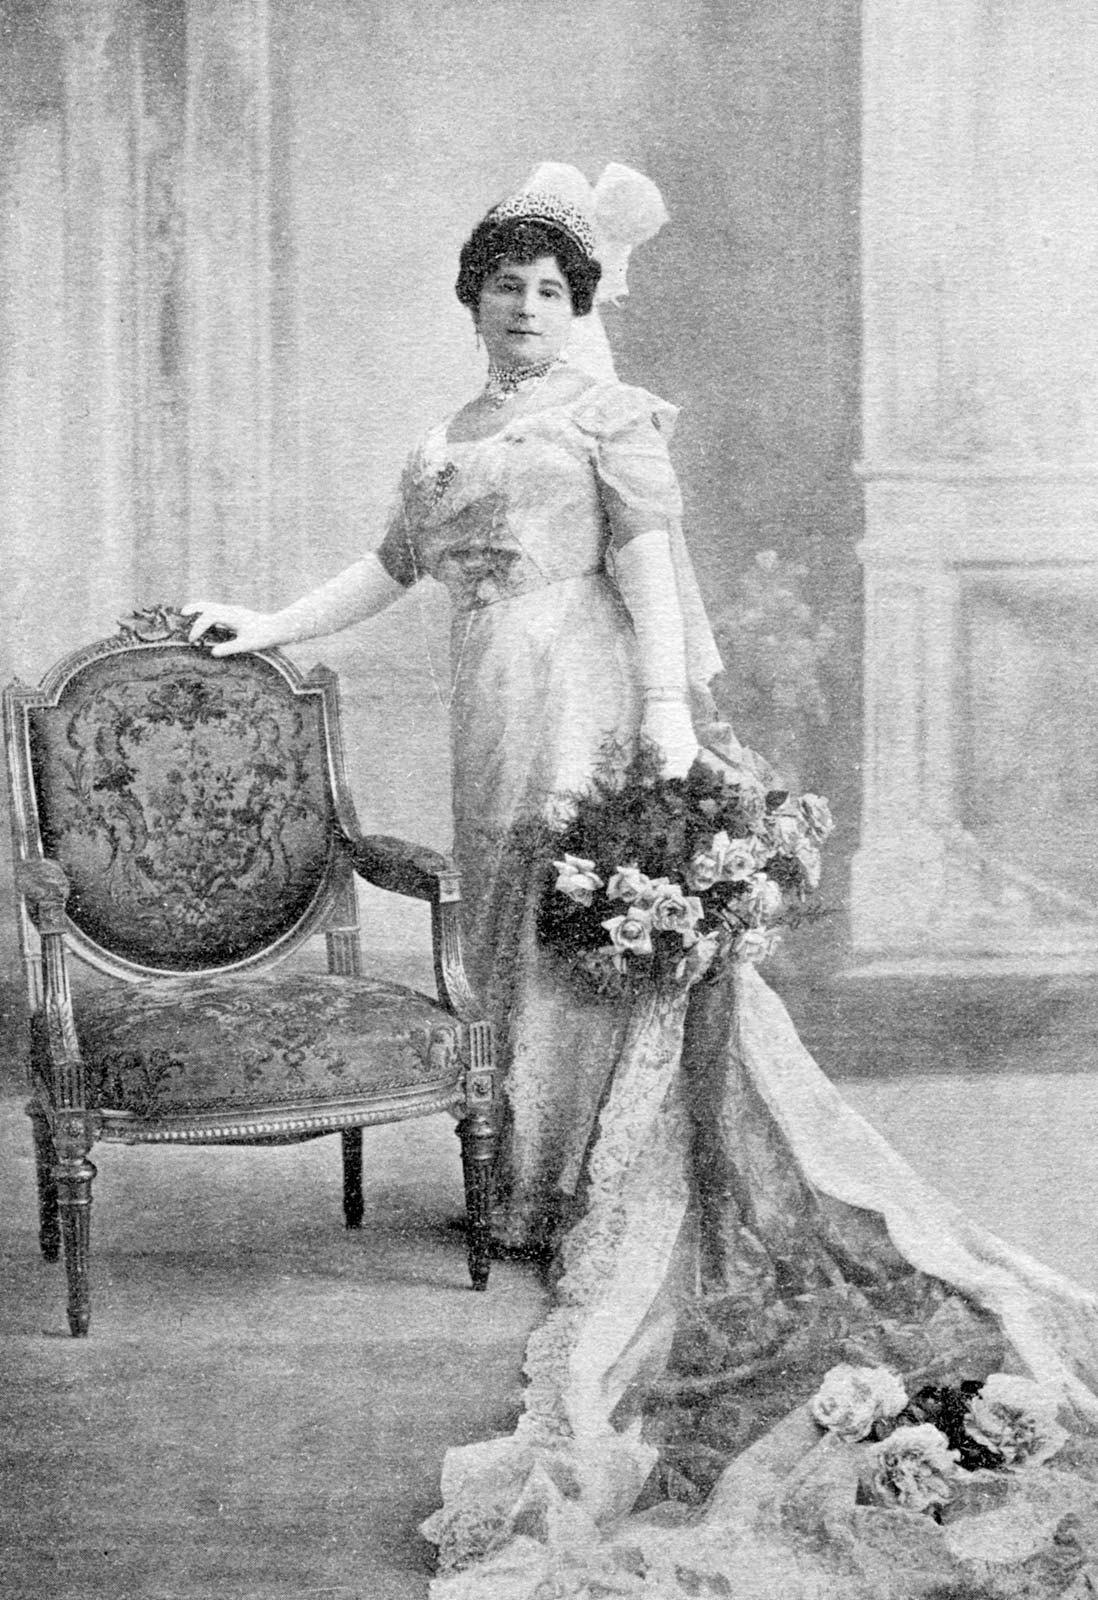 Baroness Emmuska Orczy in 1913